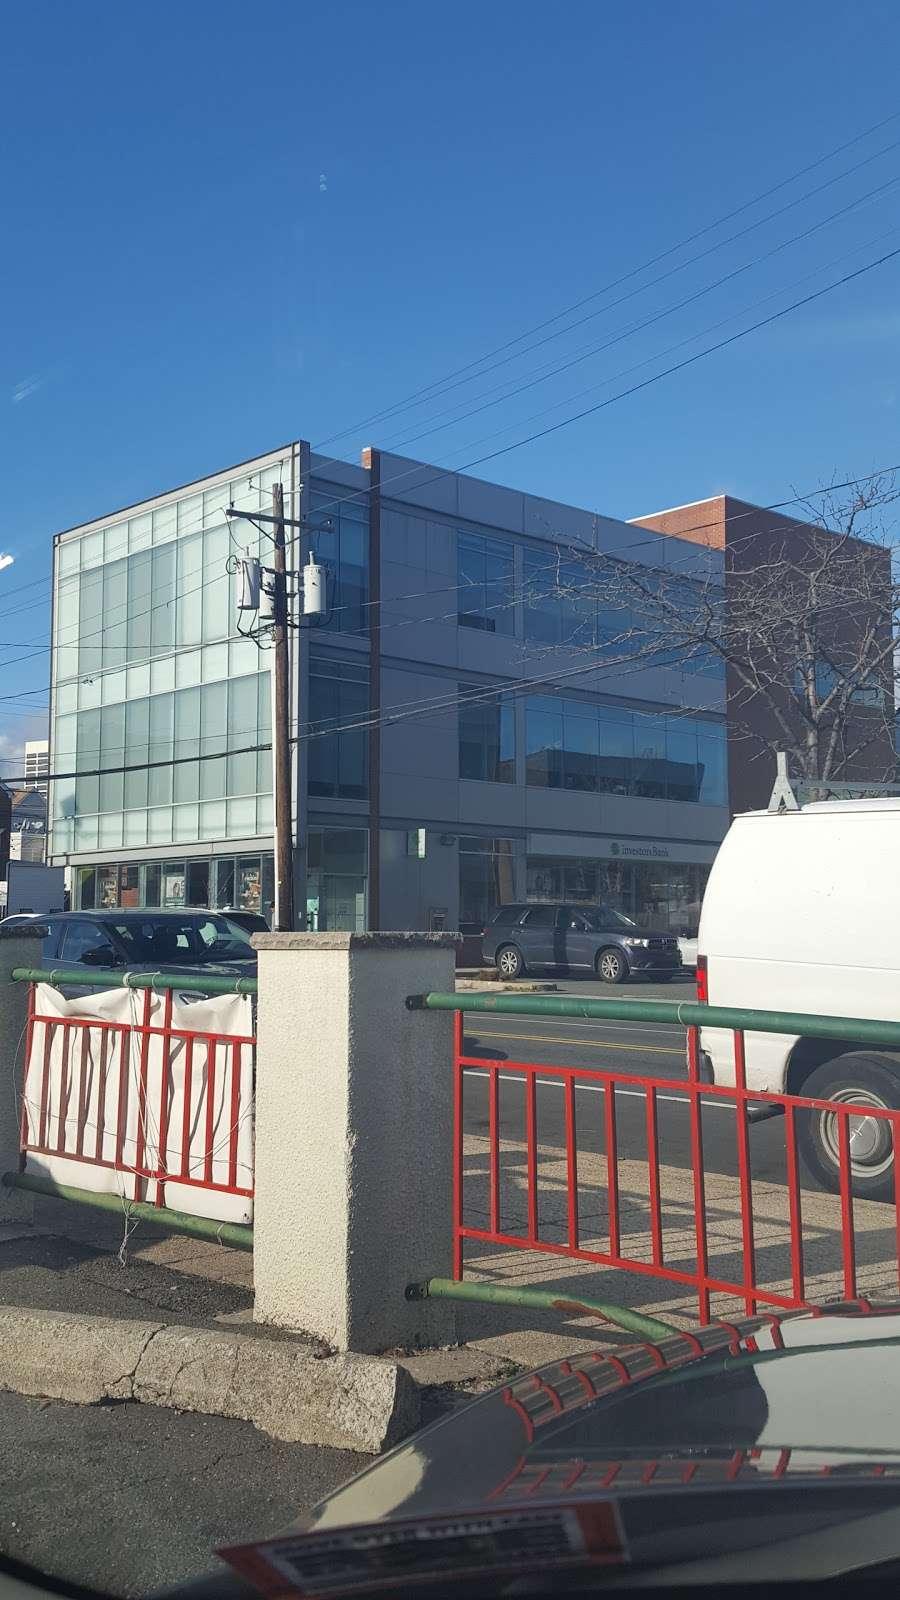 Investors Bank - bank  | Photo 1 of 2 | Address: 255 Lafayette St, Newark, NJ 07105, USA | Phone: (973) 522-1994